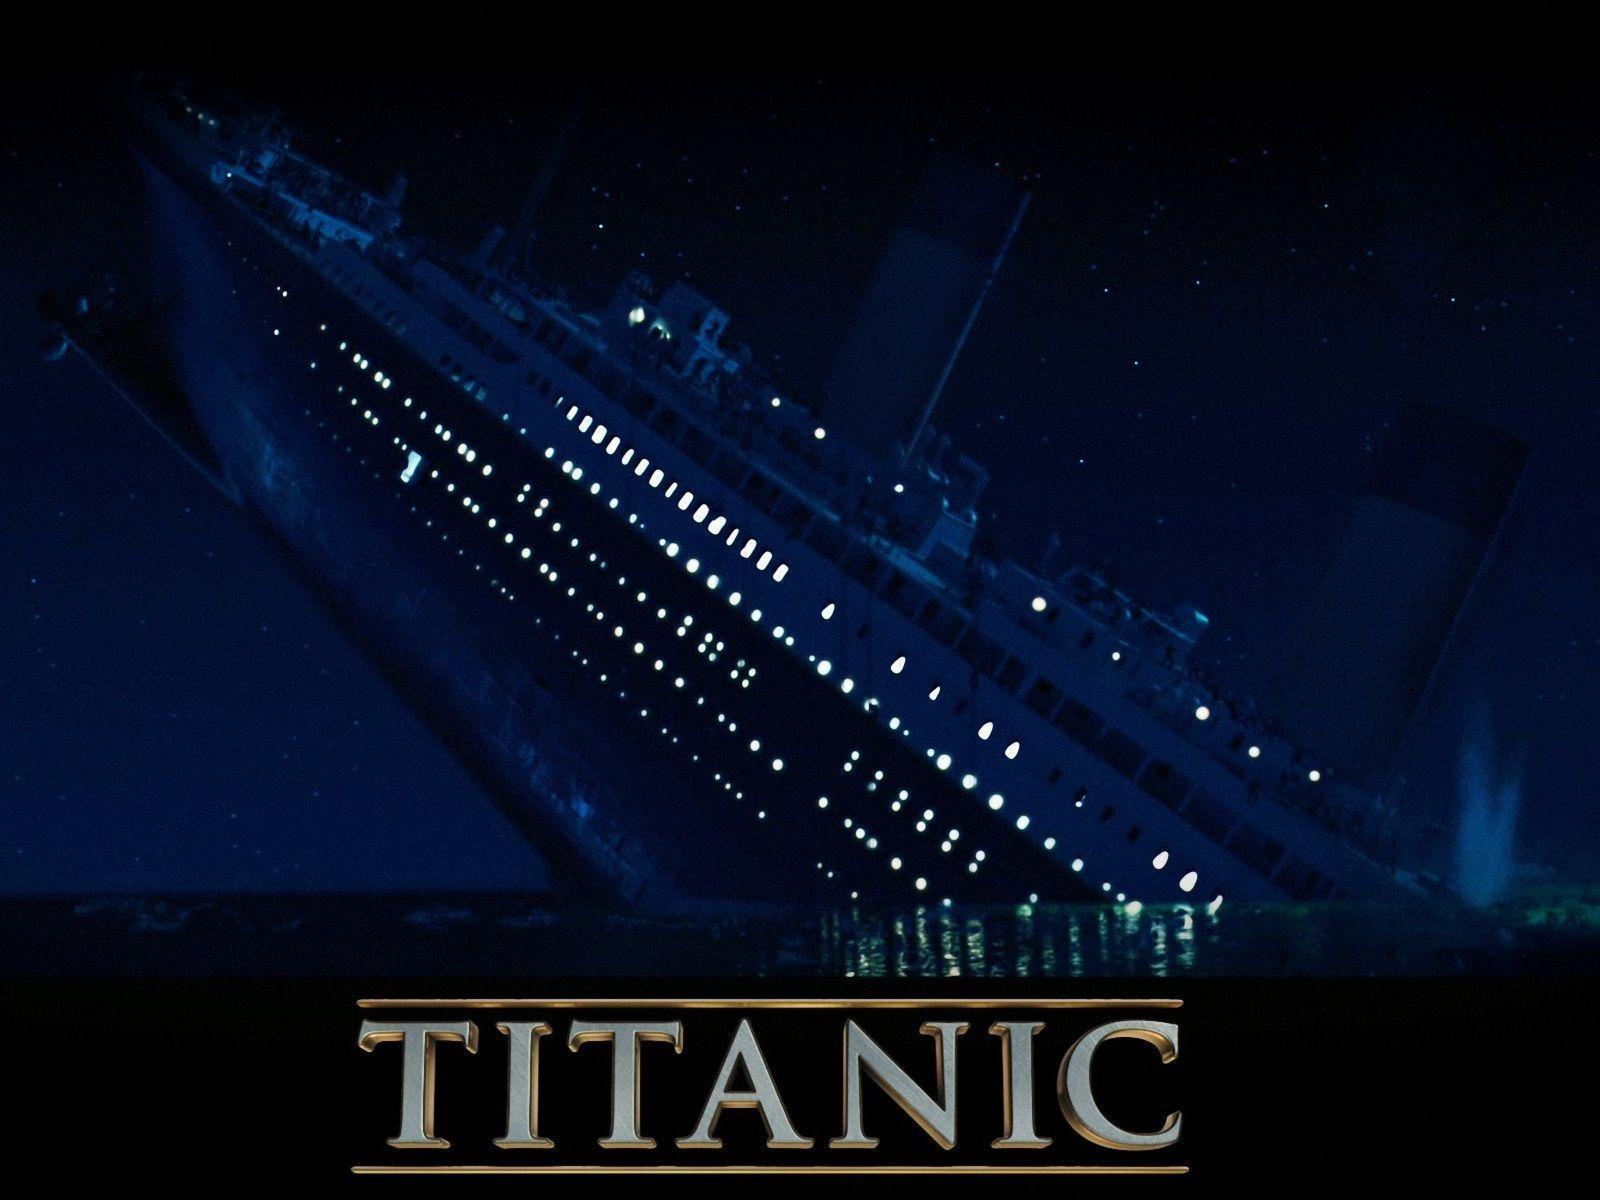 titanic wallpaper Wallpapers - Free titanic wallpaper Wallpapers ...